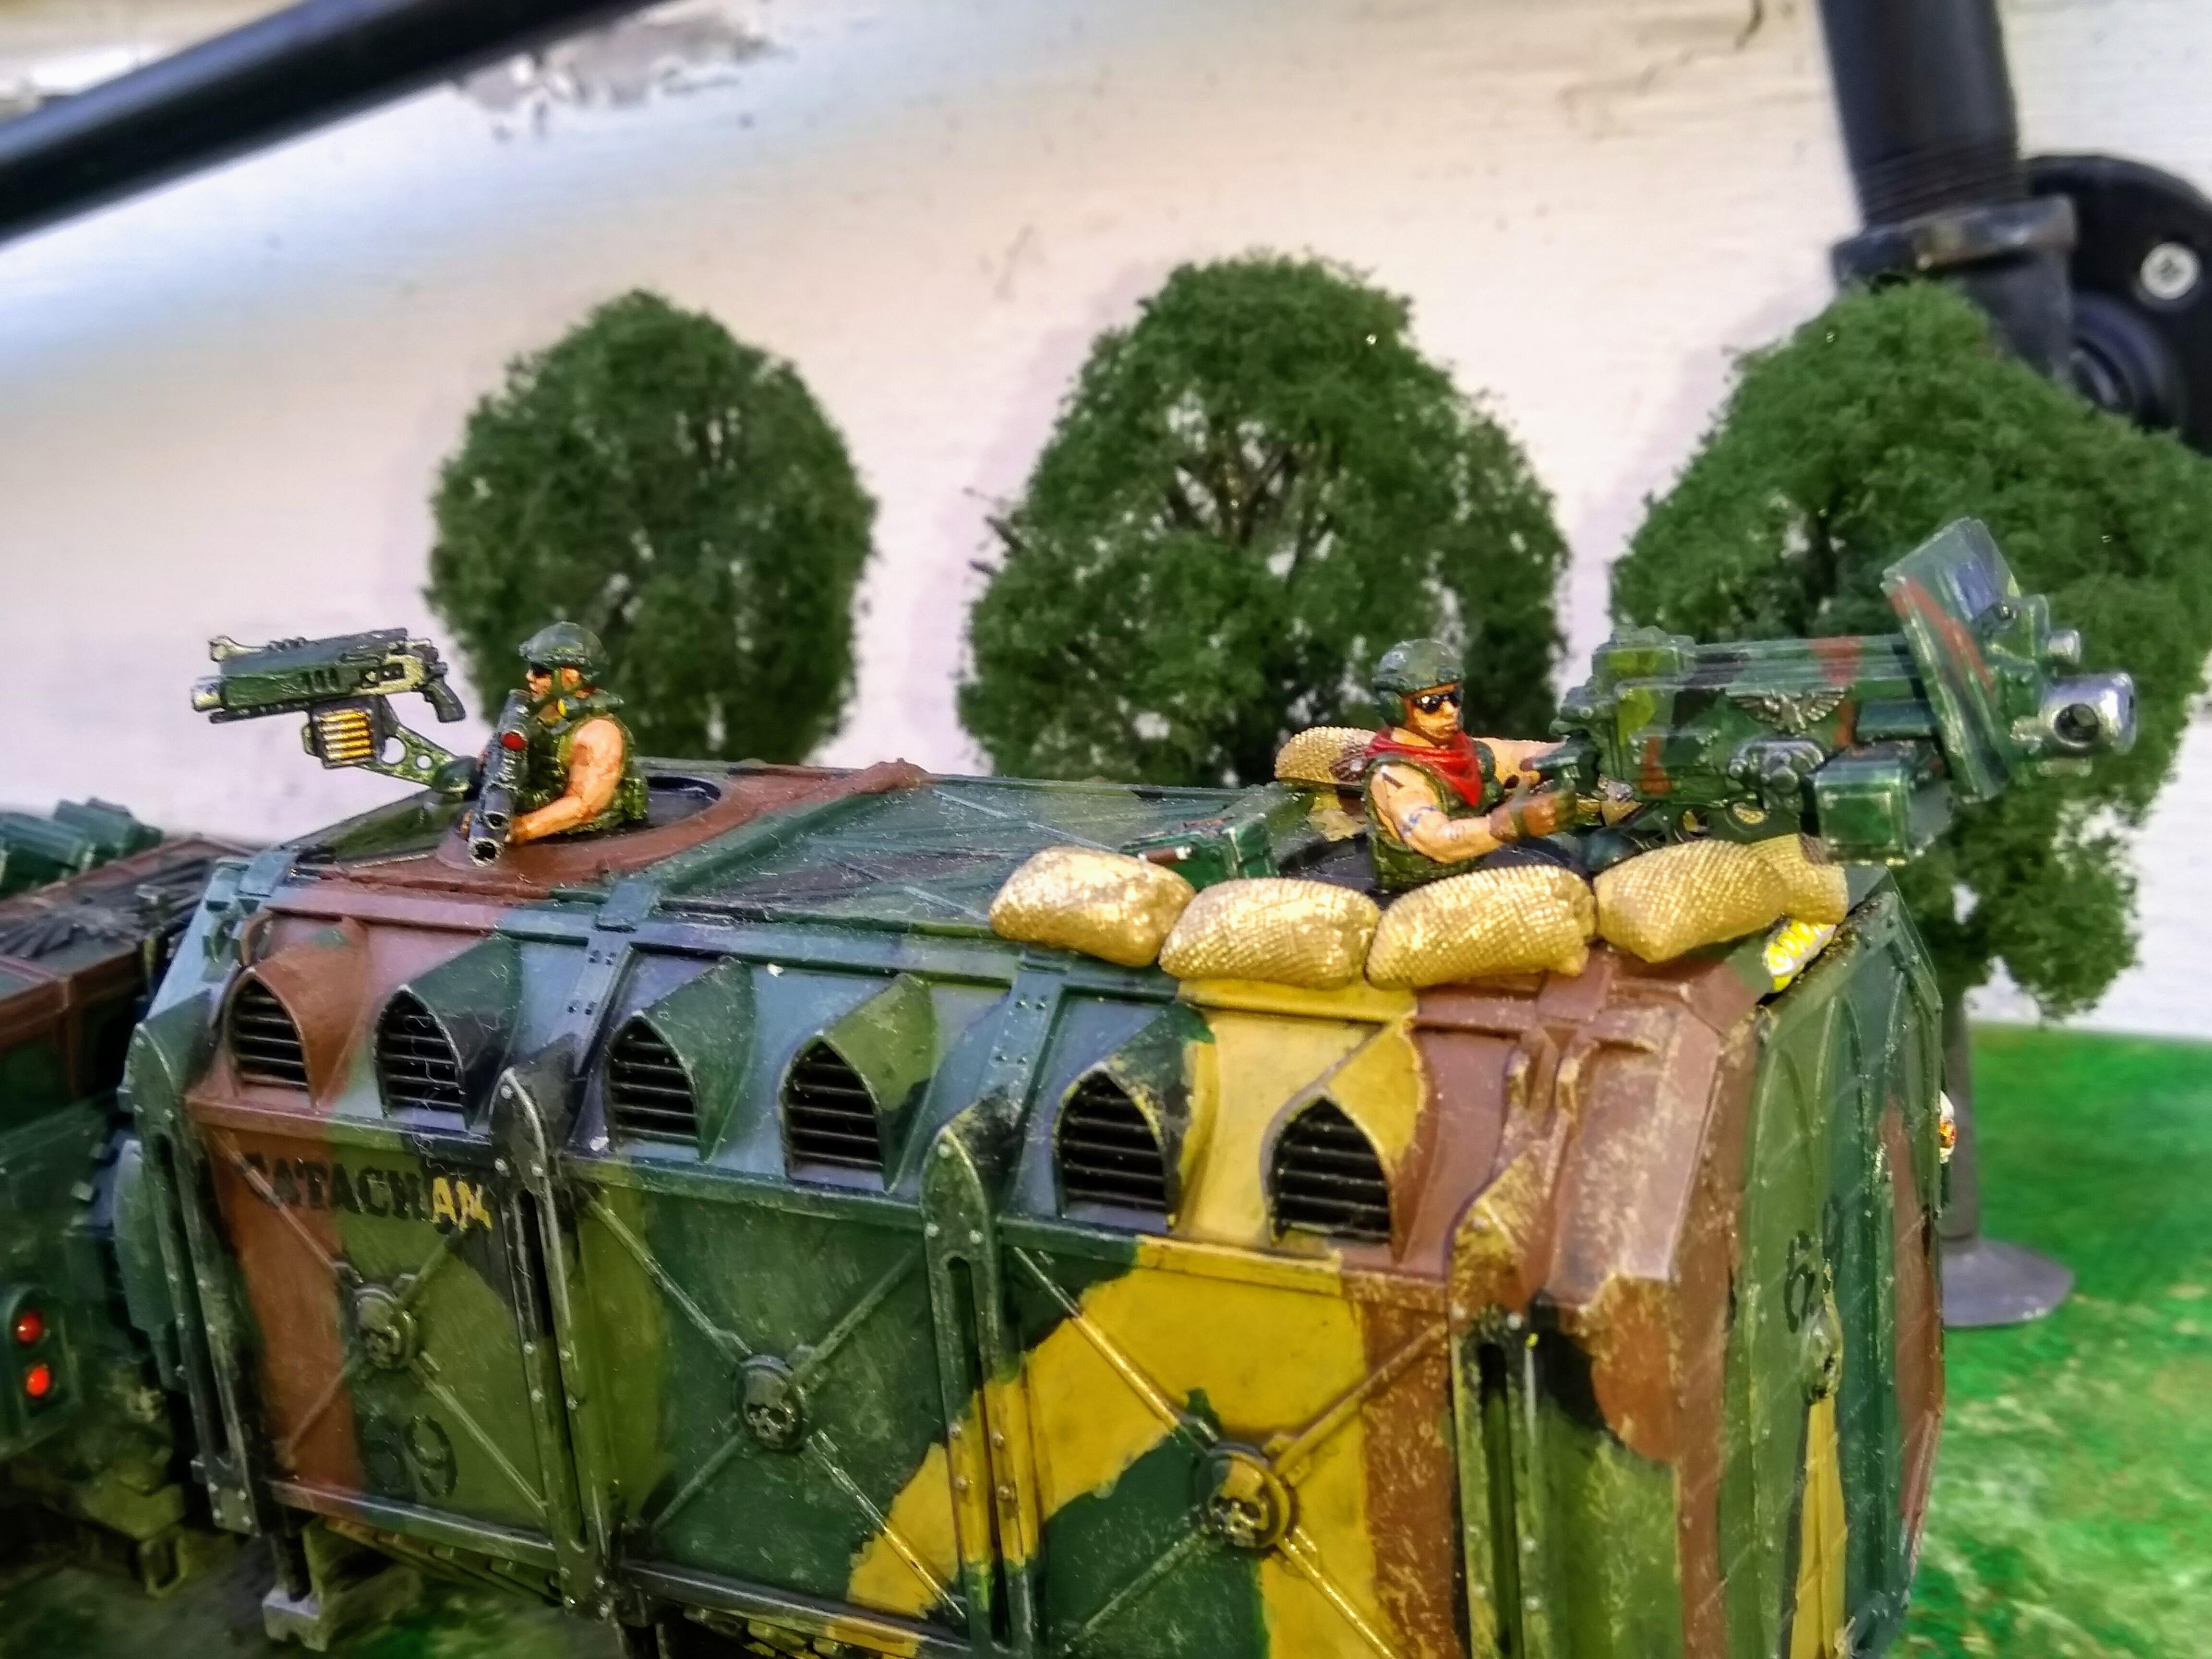 Apc, Canyonero, Catachan, Imperial Guard, Kitbash, Road-train